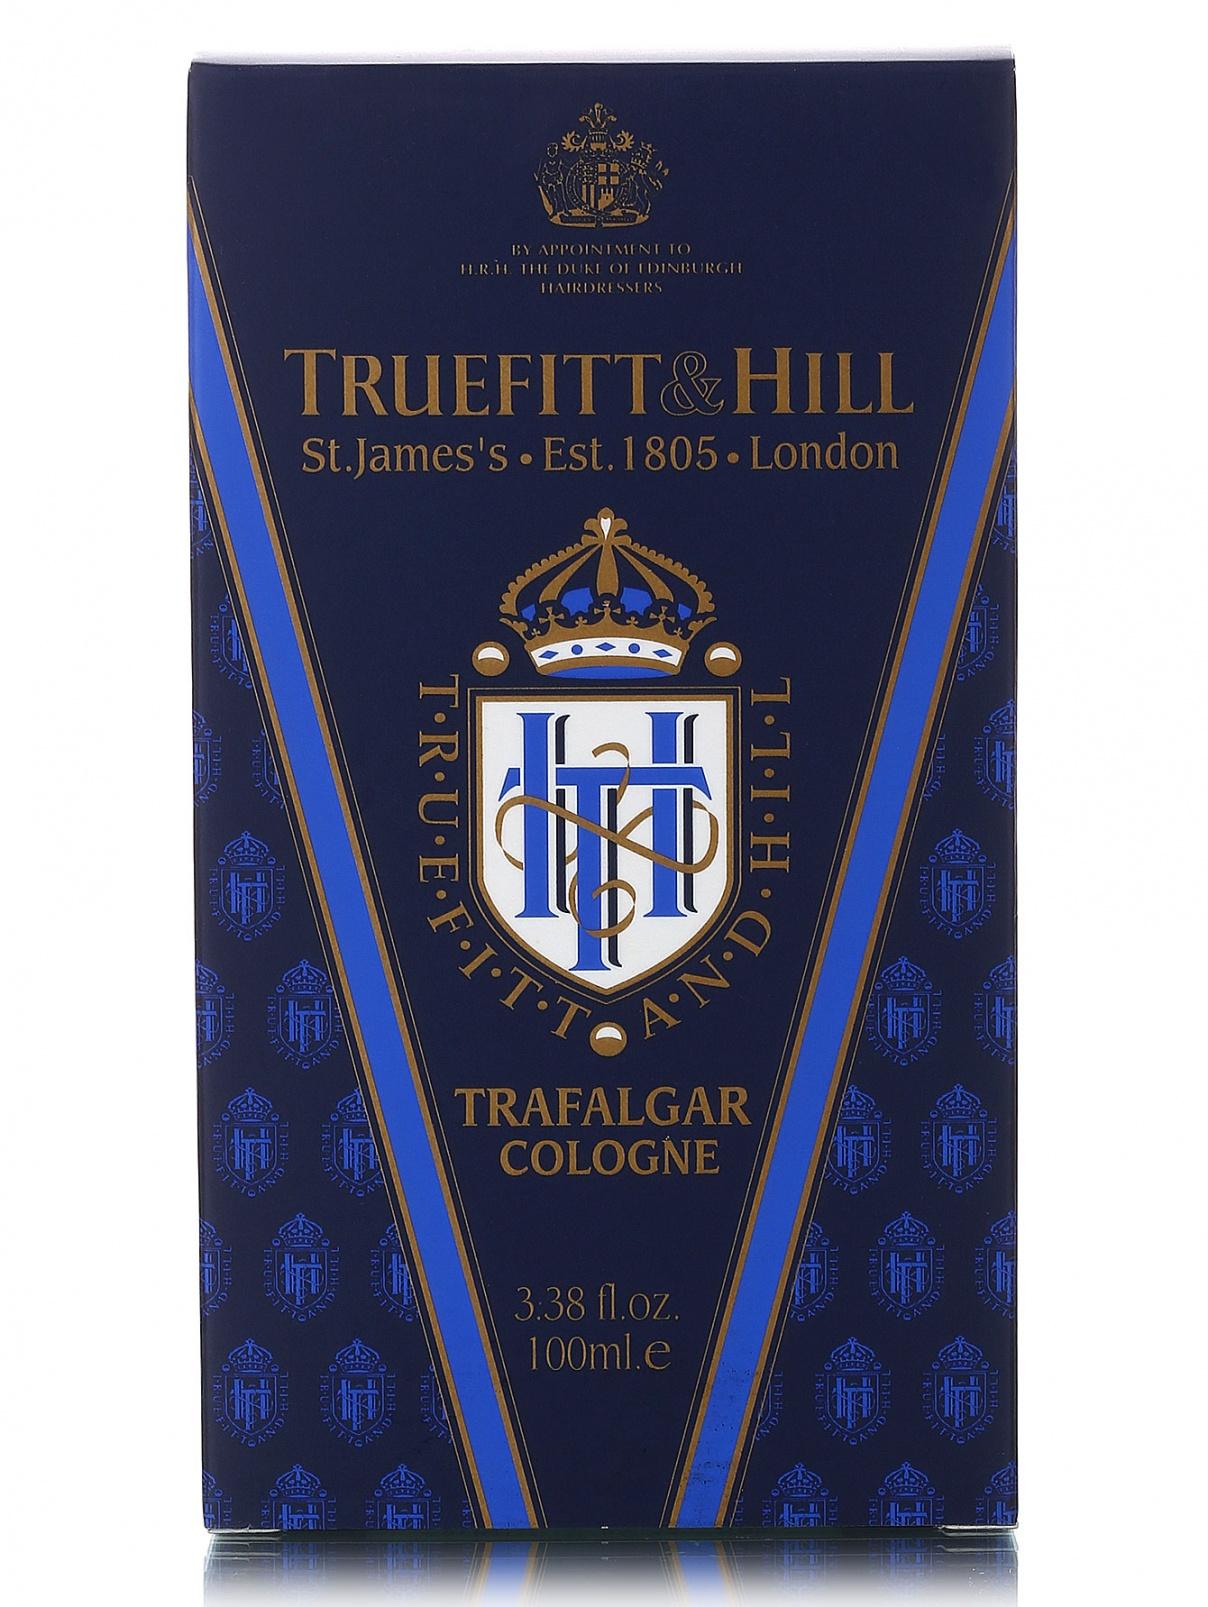 Одеколон - Trafalgar, 100ml Truefitt & Hill  –  Модель Общий вид